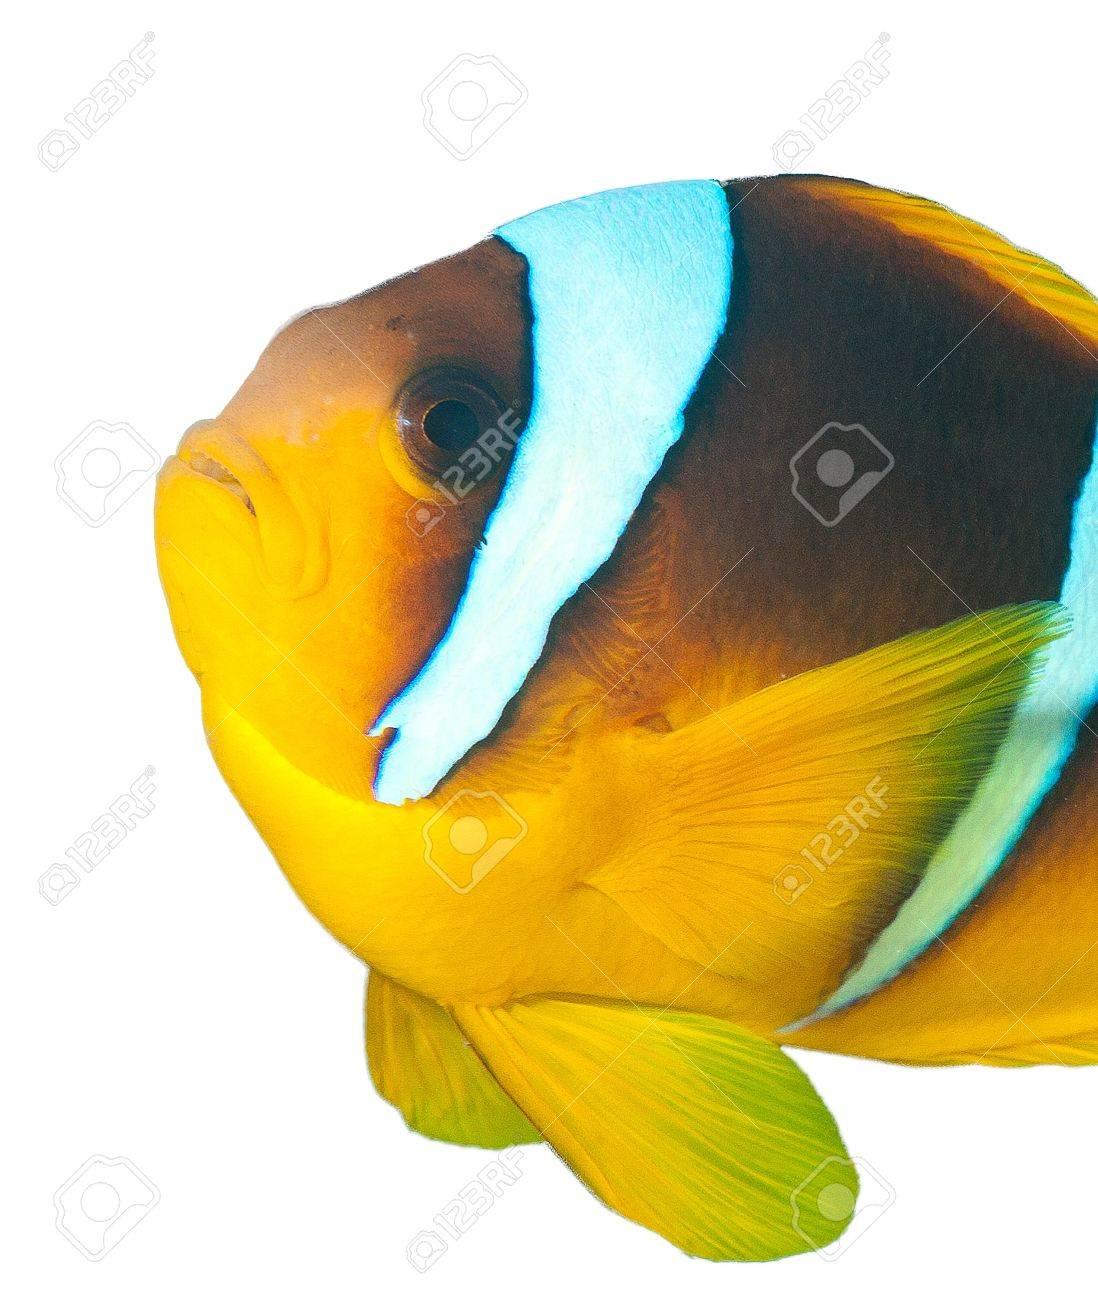 Clownfish on a white background Stock Photo - 16942073